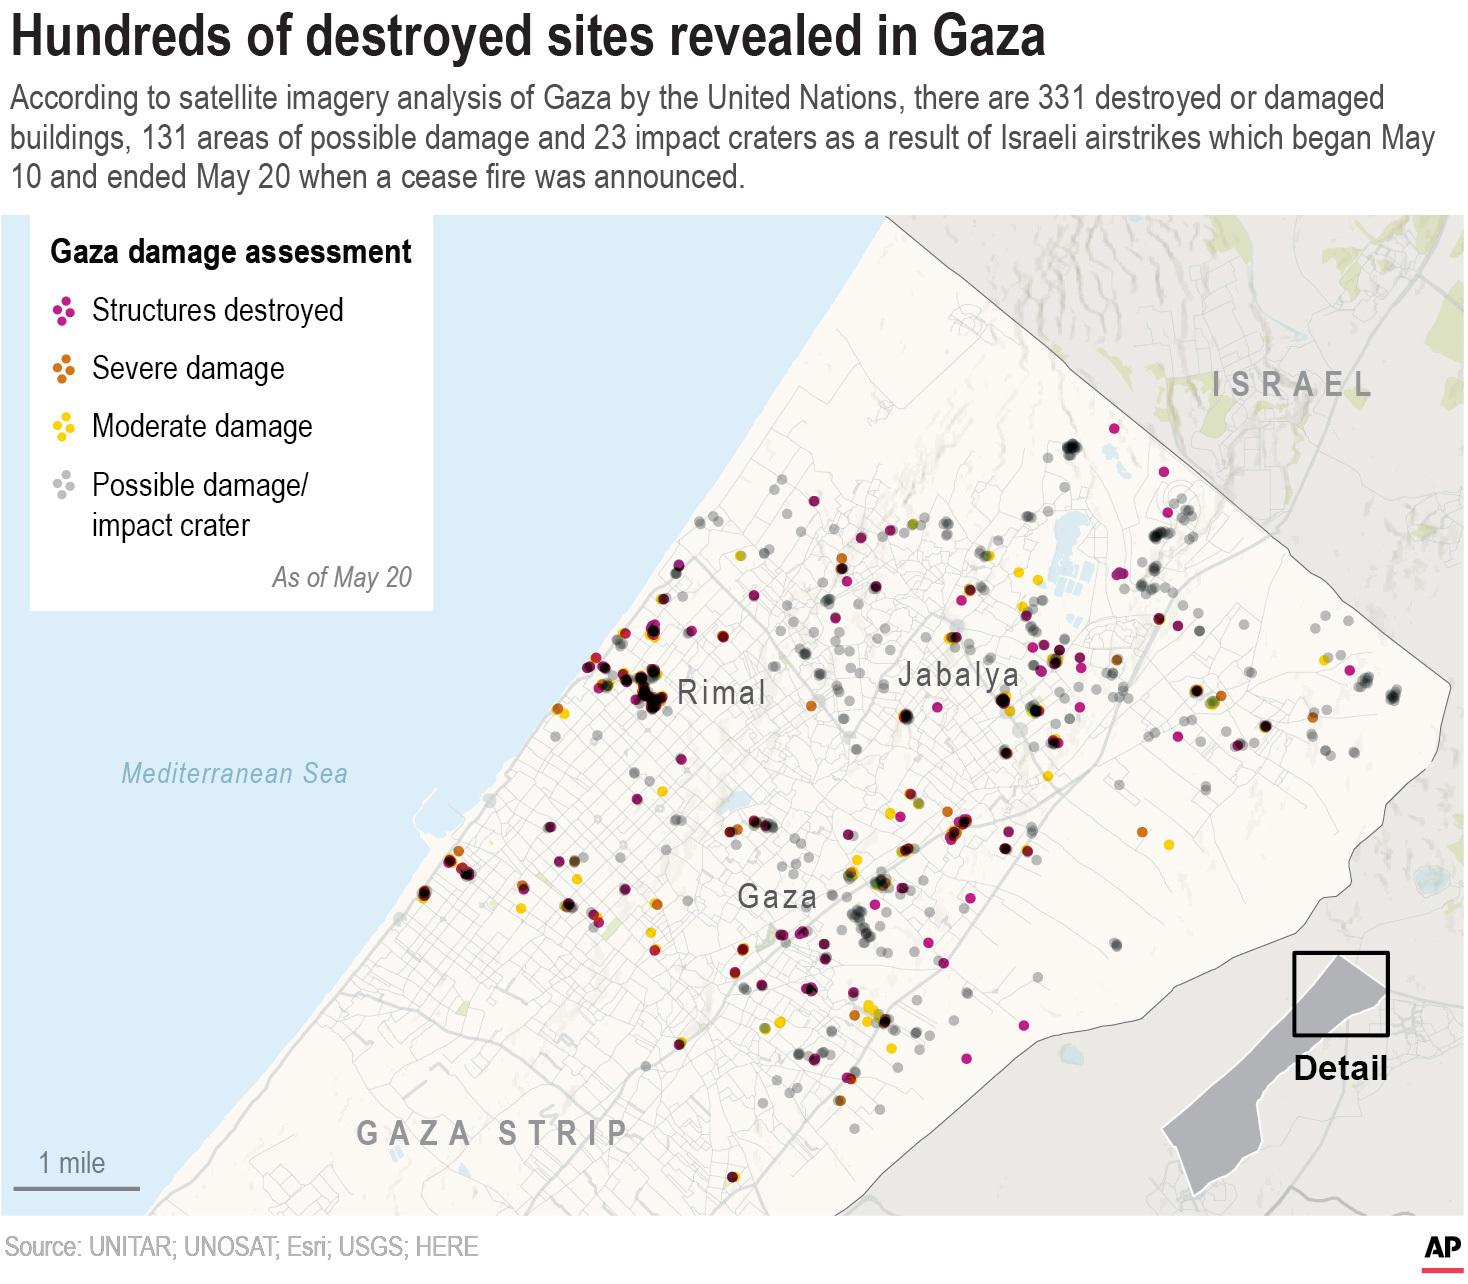 Gaza Damage Assessment